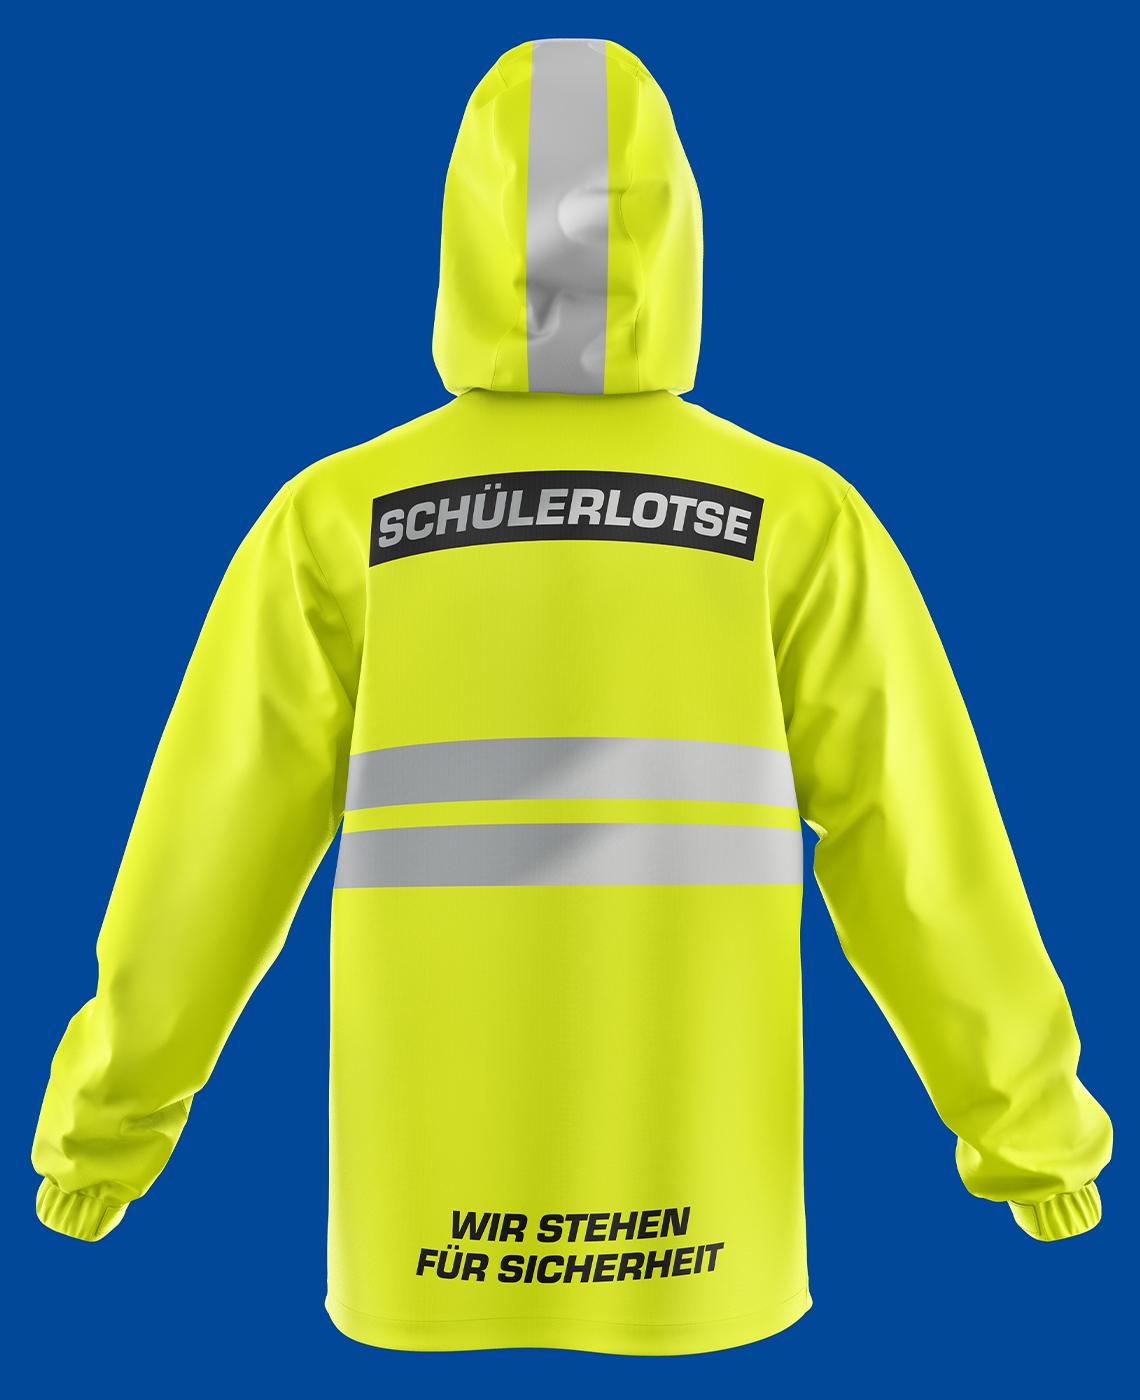 kfv_schuelerlotsen_3